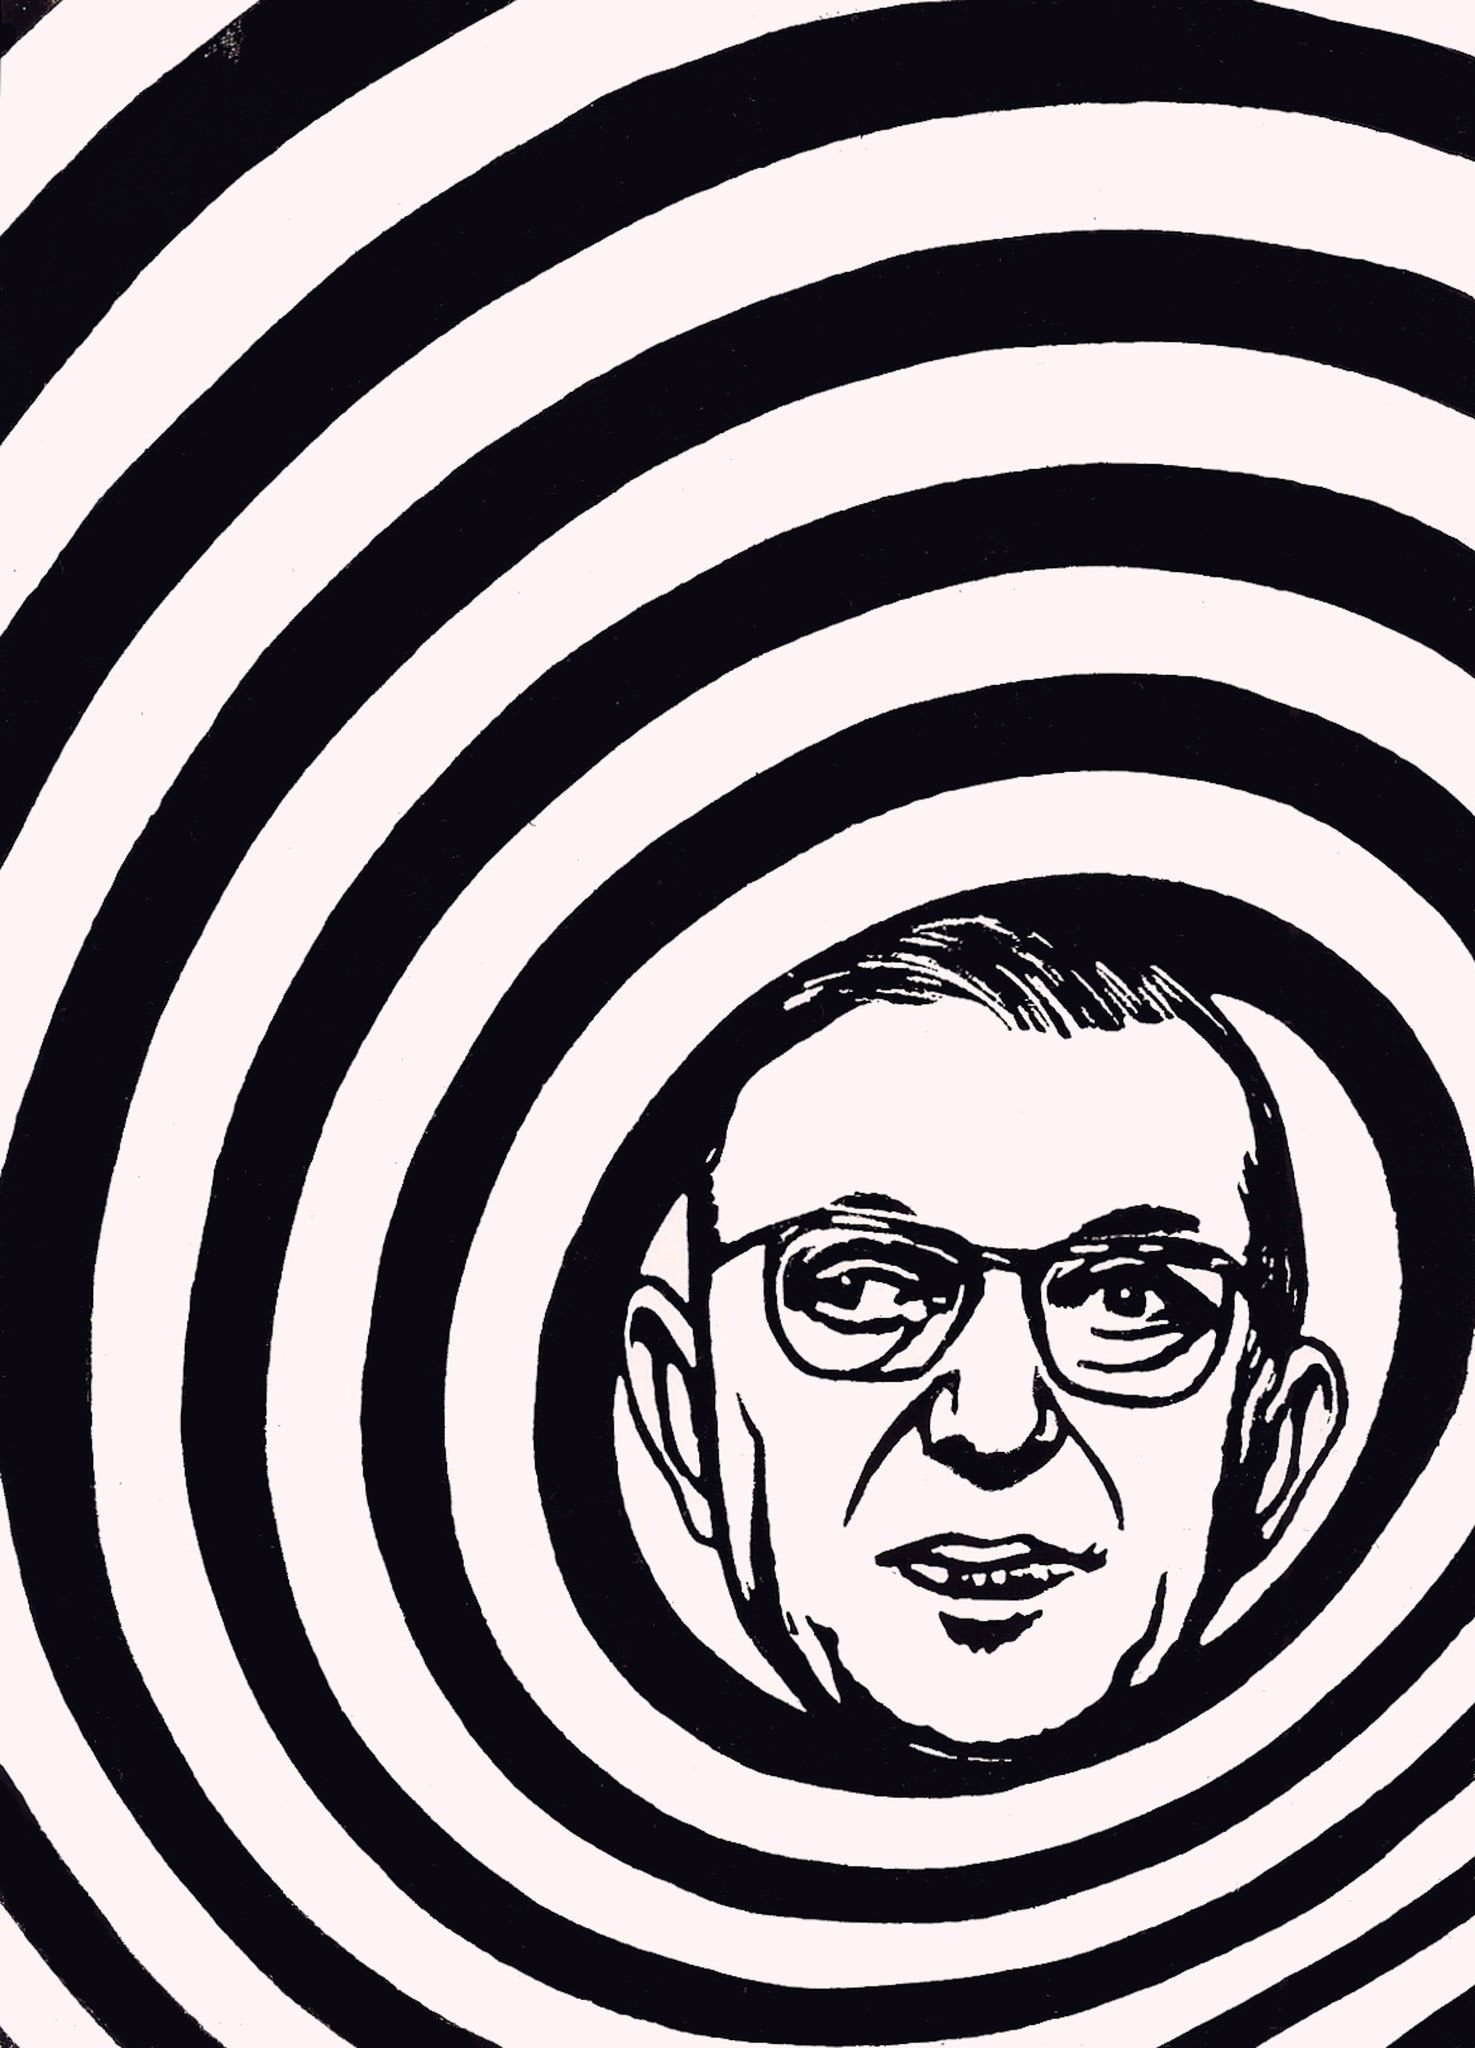 Jean-Paul Sartre, 23/12/2017, Edition 5, A5